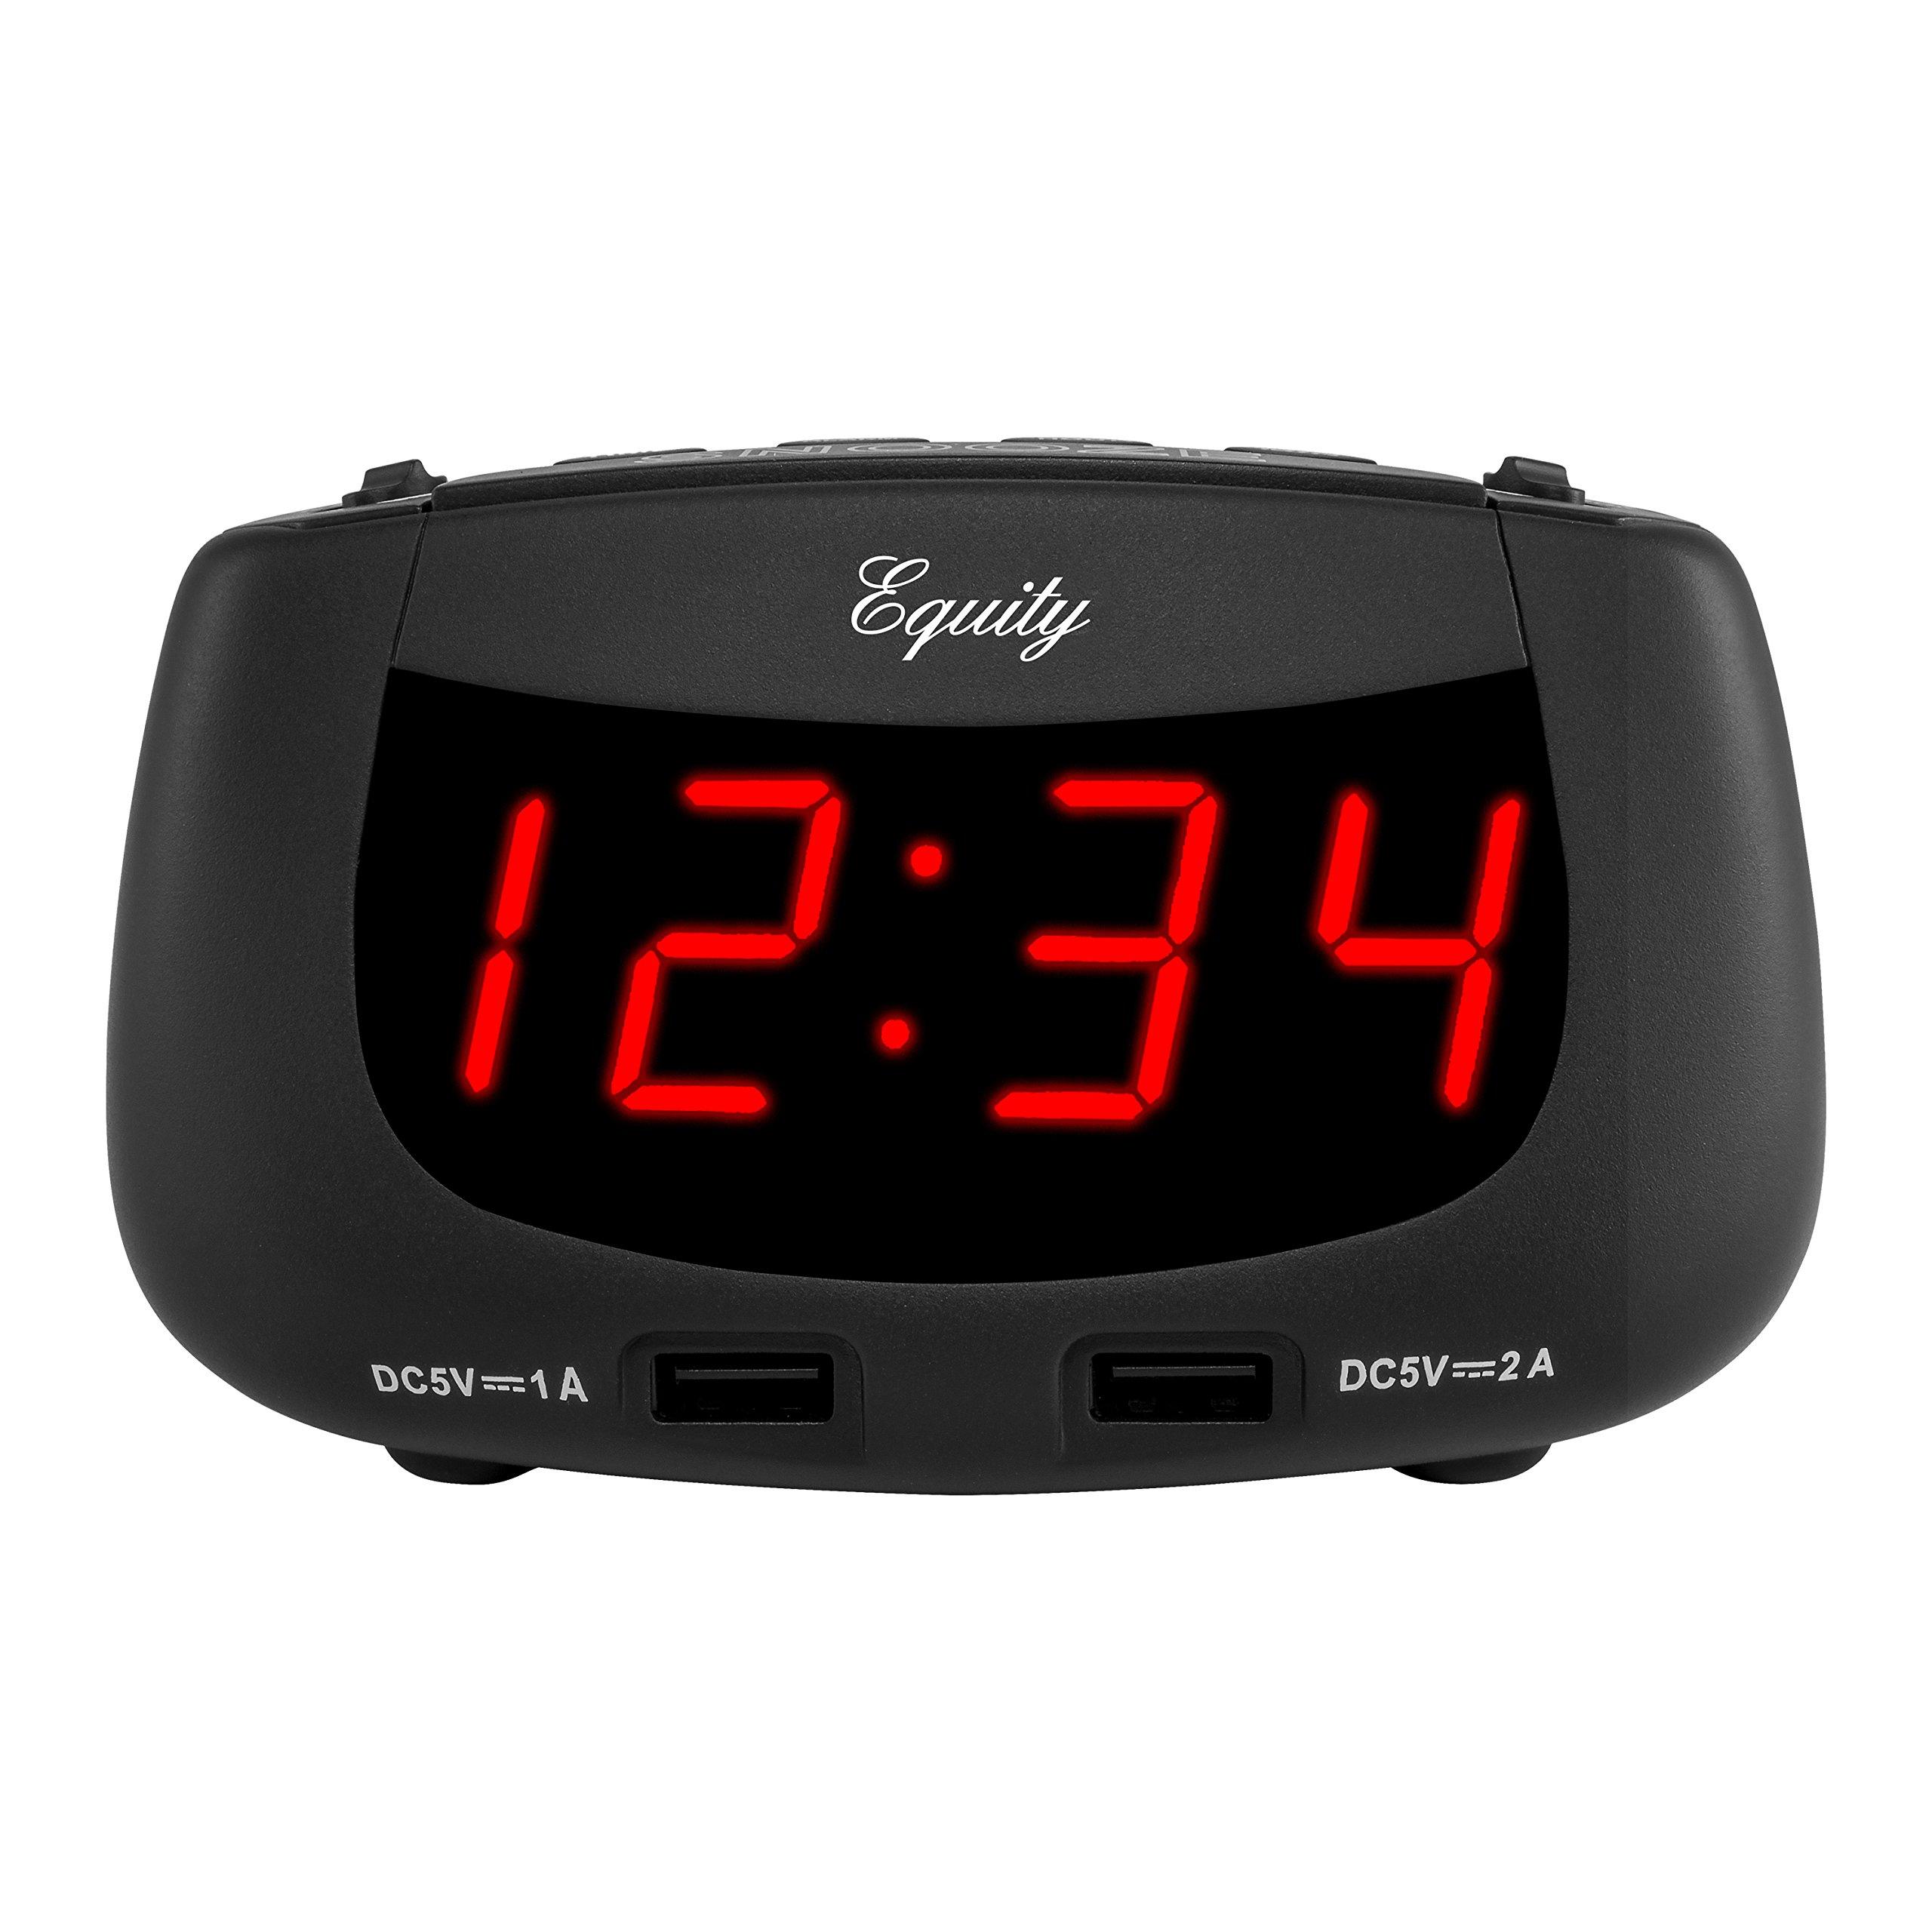 Equity by La Crosse 30416 0.9'' LED Dual USB Alarm Clock